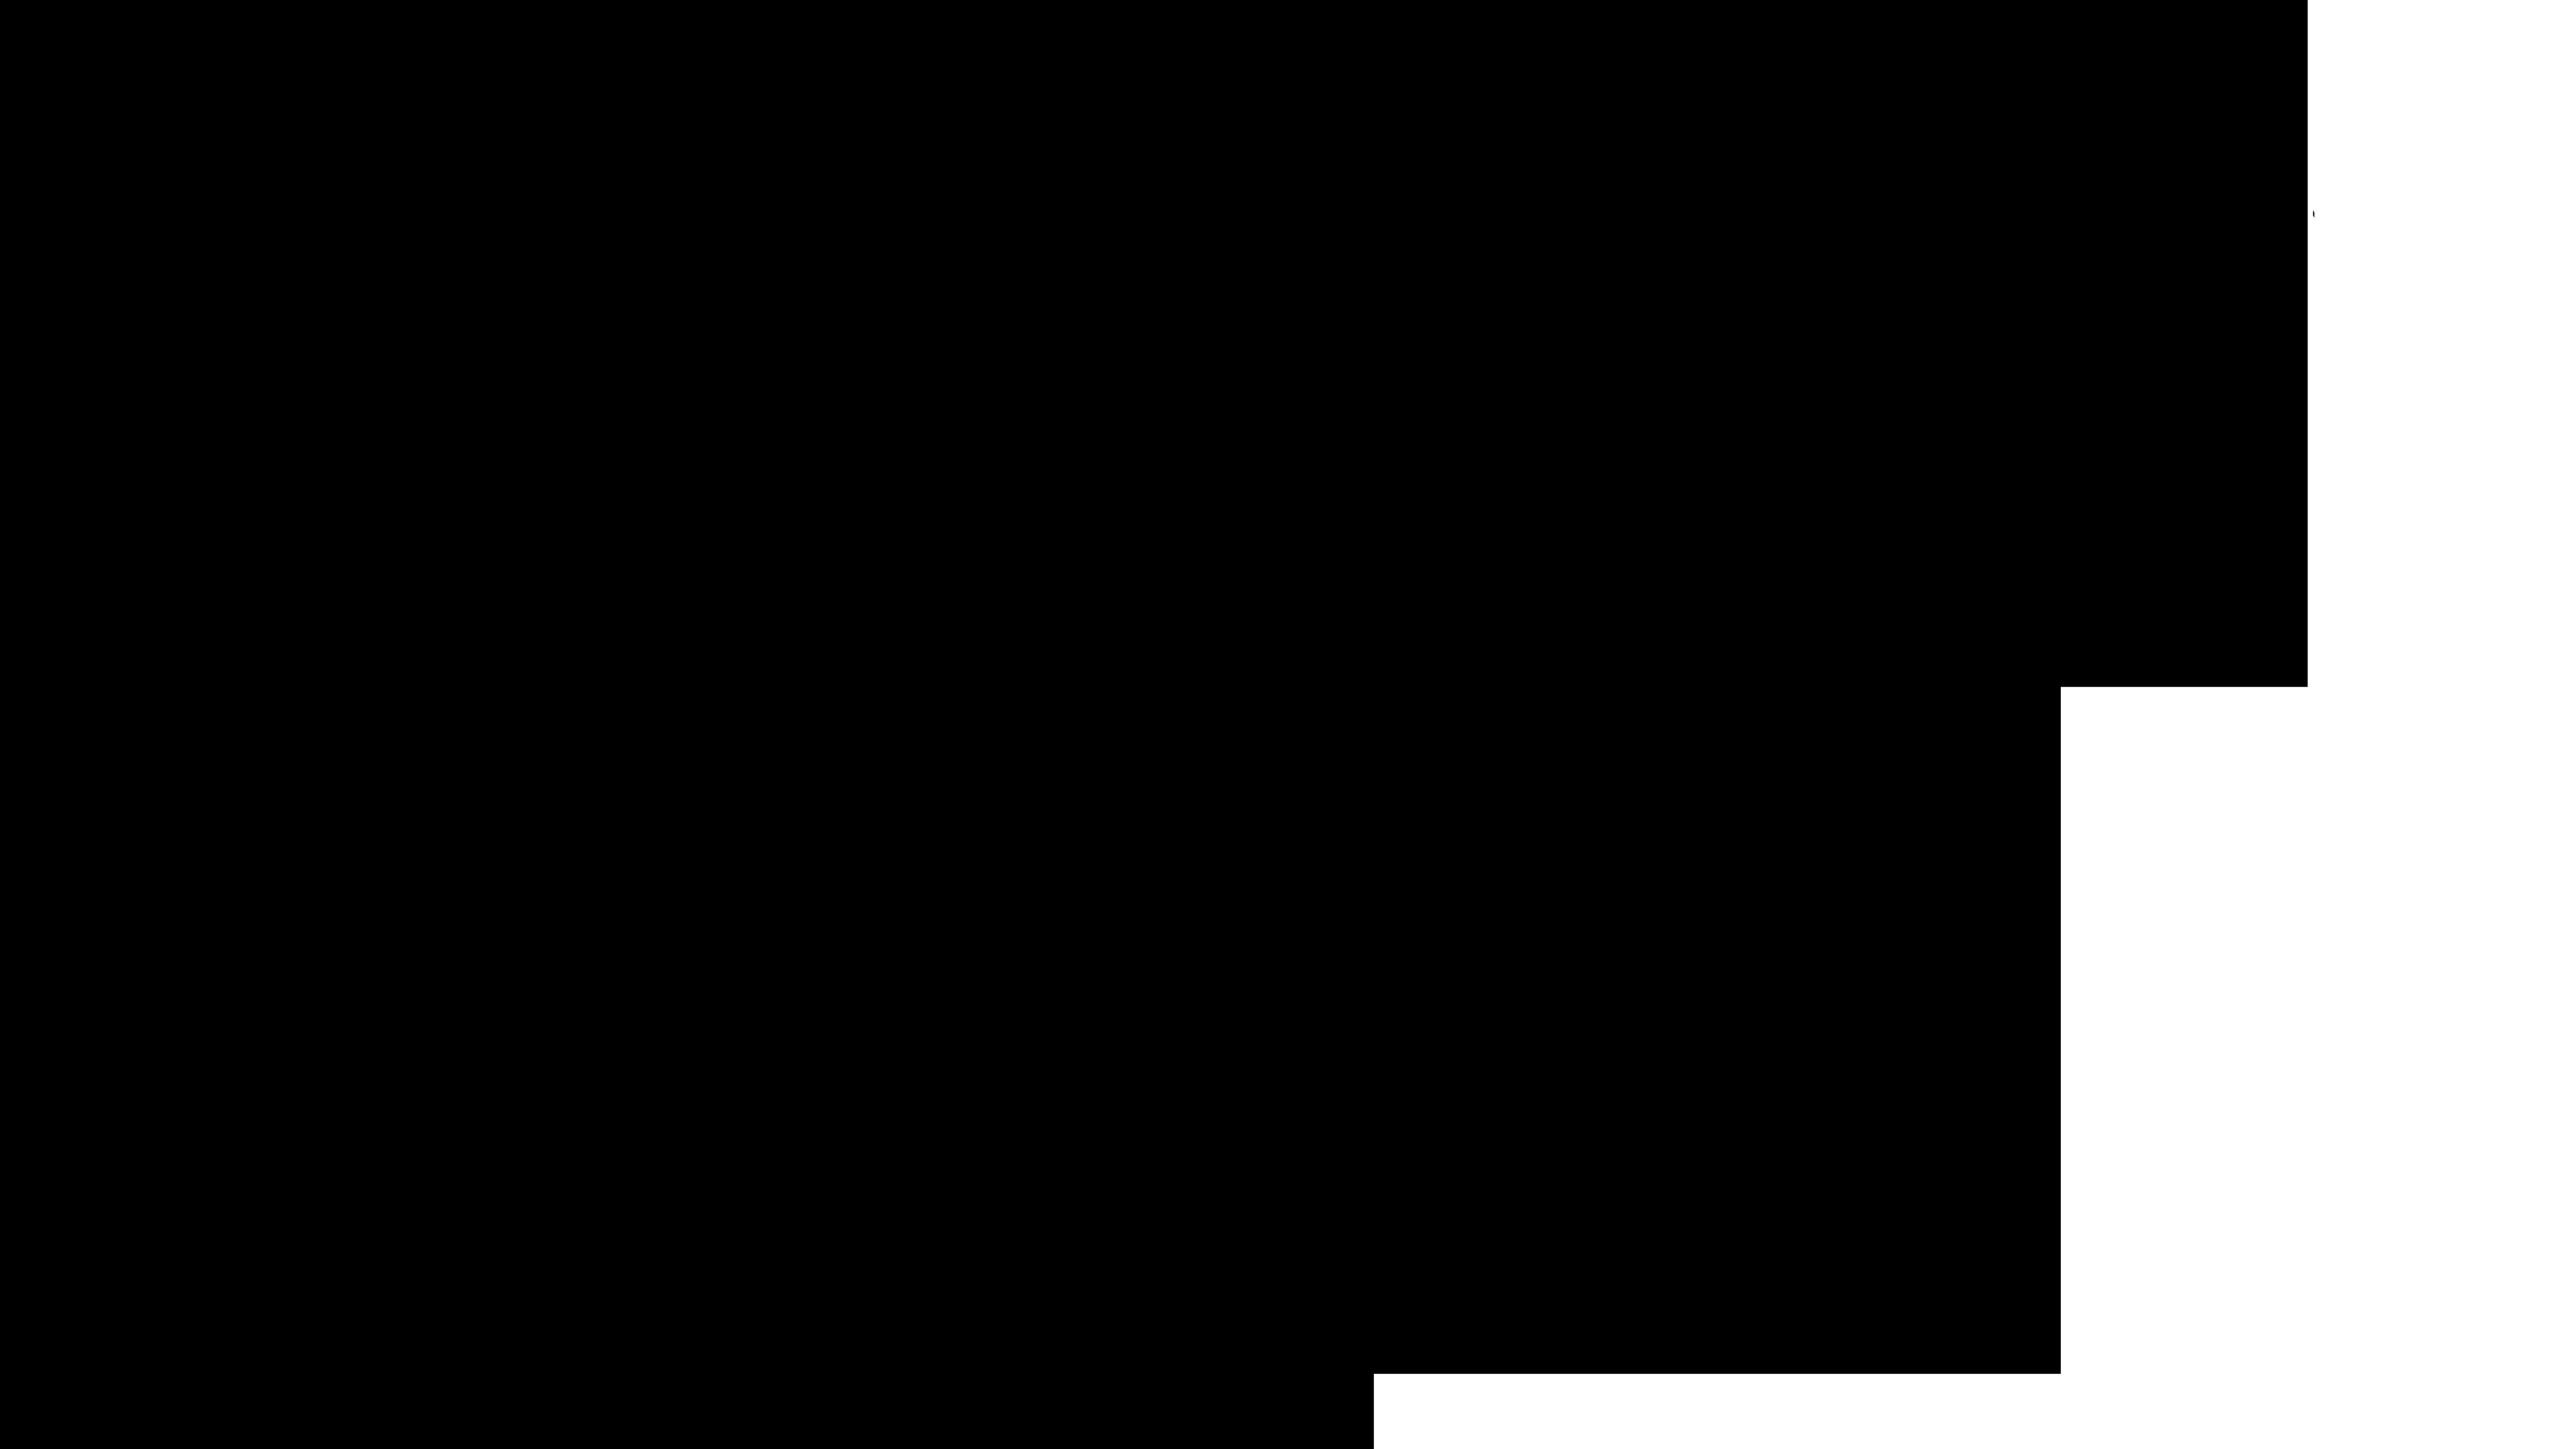 Line Art Reddit : Tokyo ghoul hide lineart k by baloohgn on deviantart